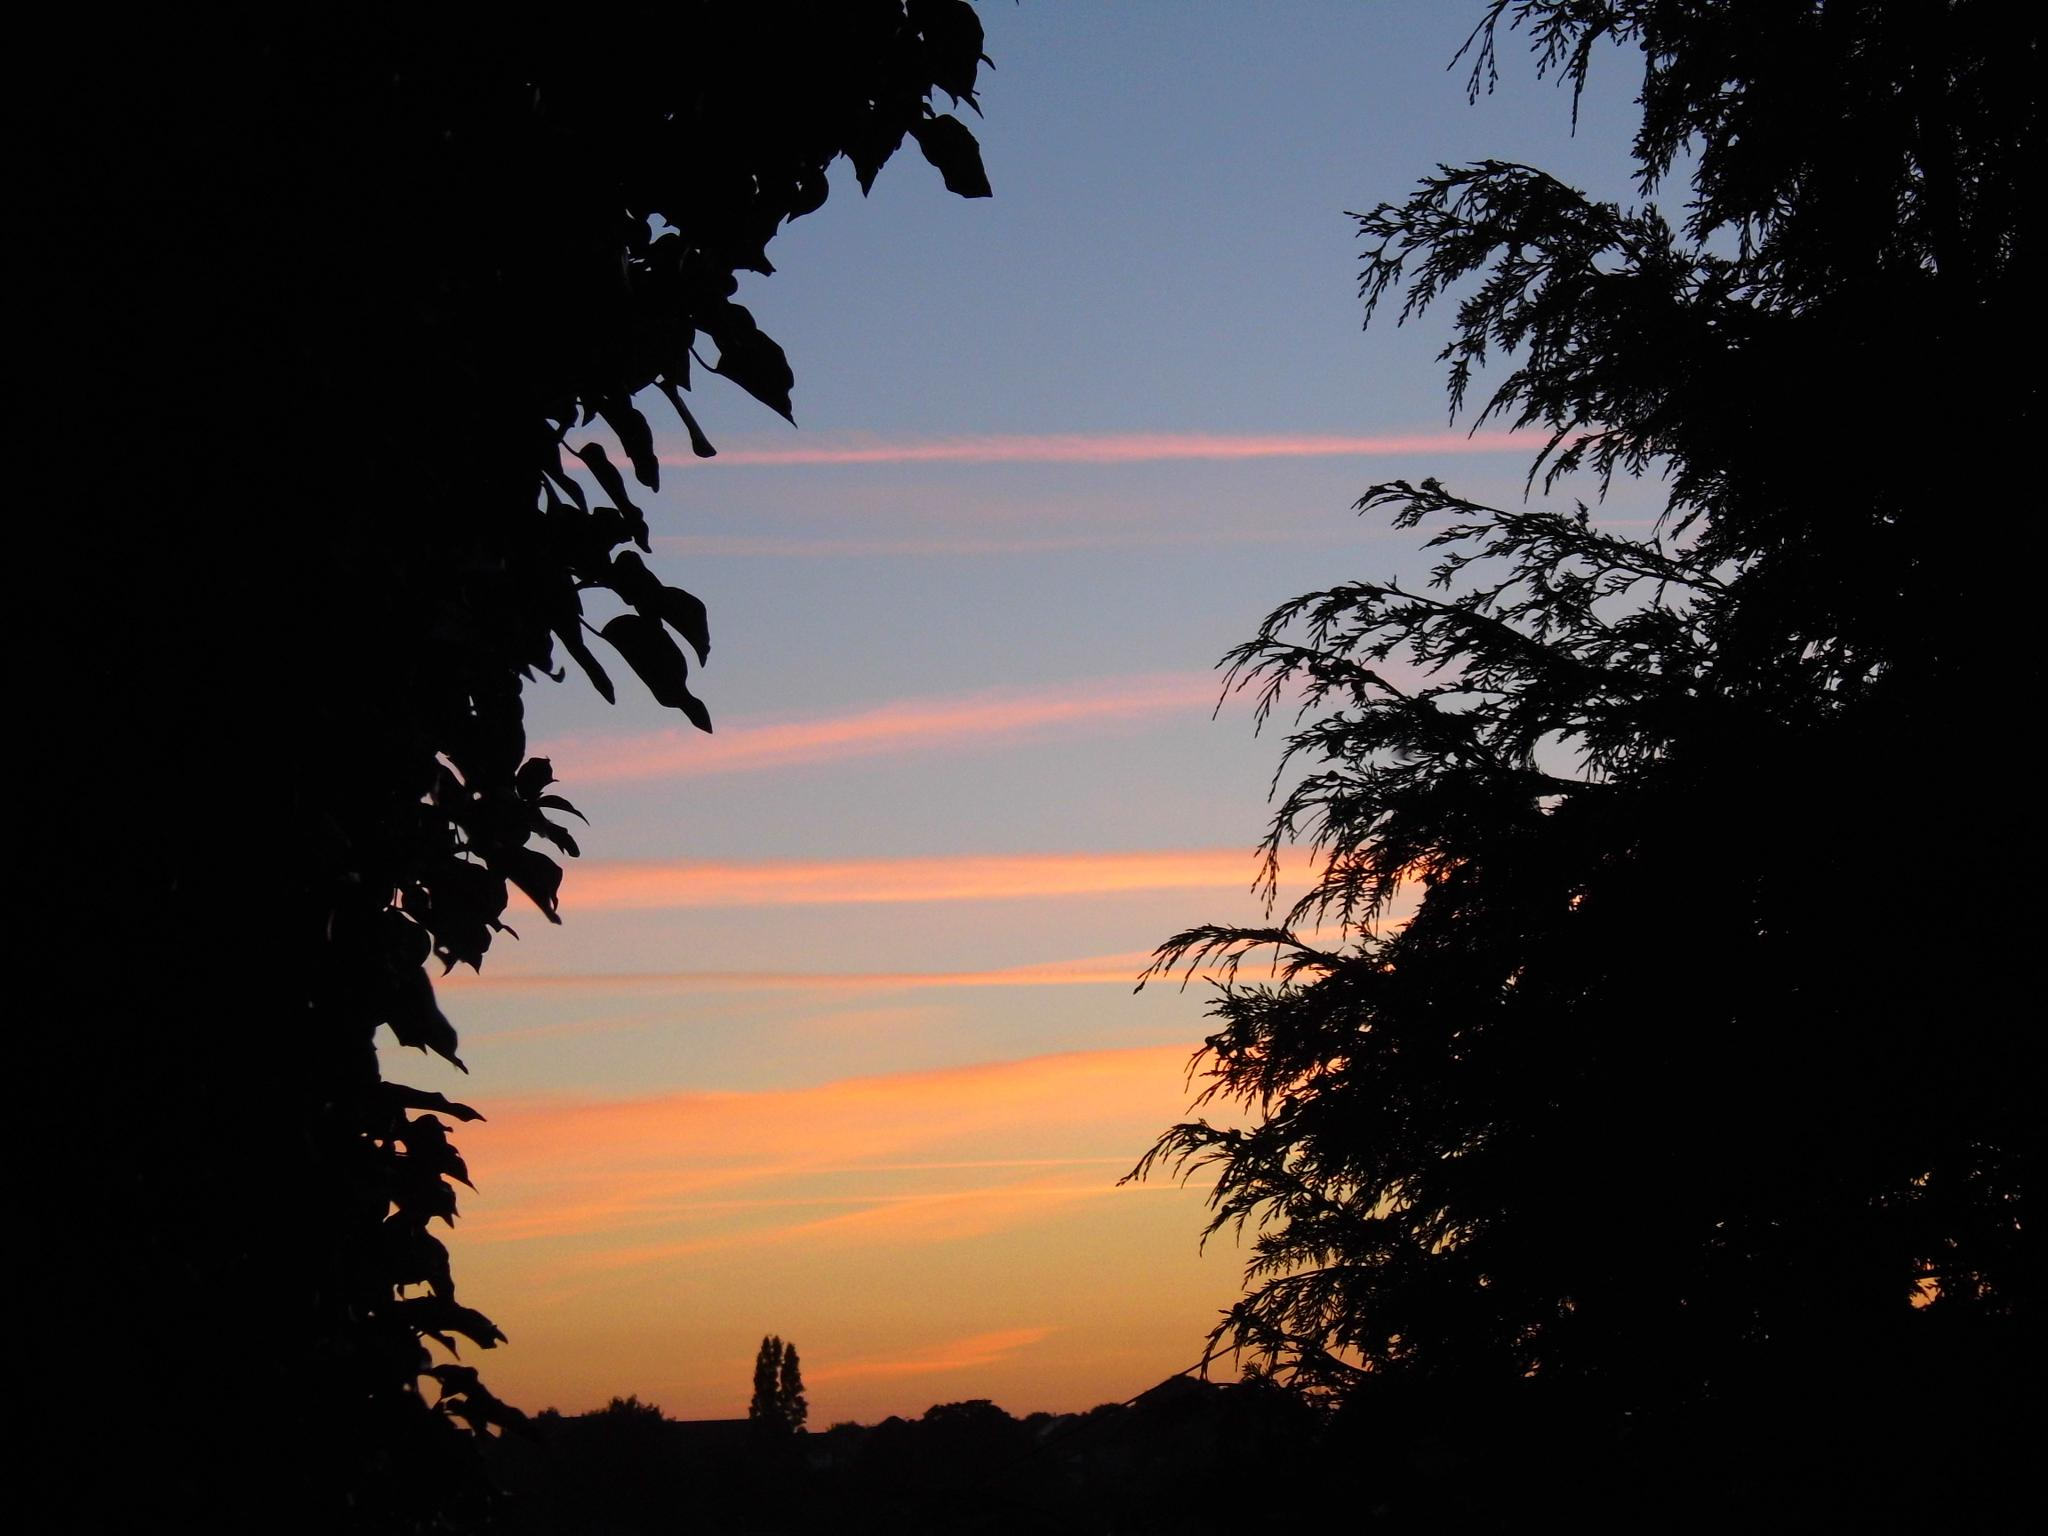 sunrise by Naomi D Tillotson-Keating